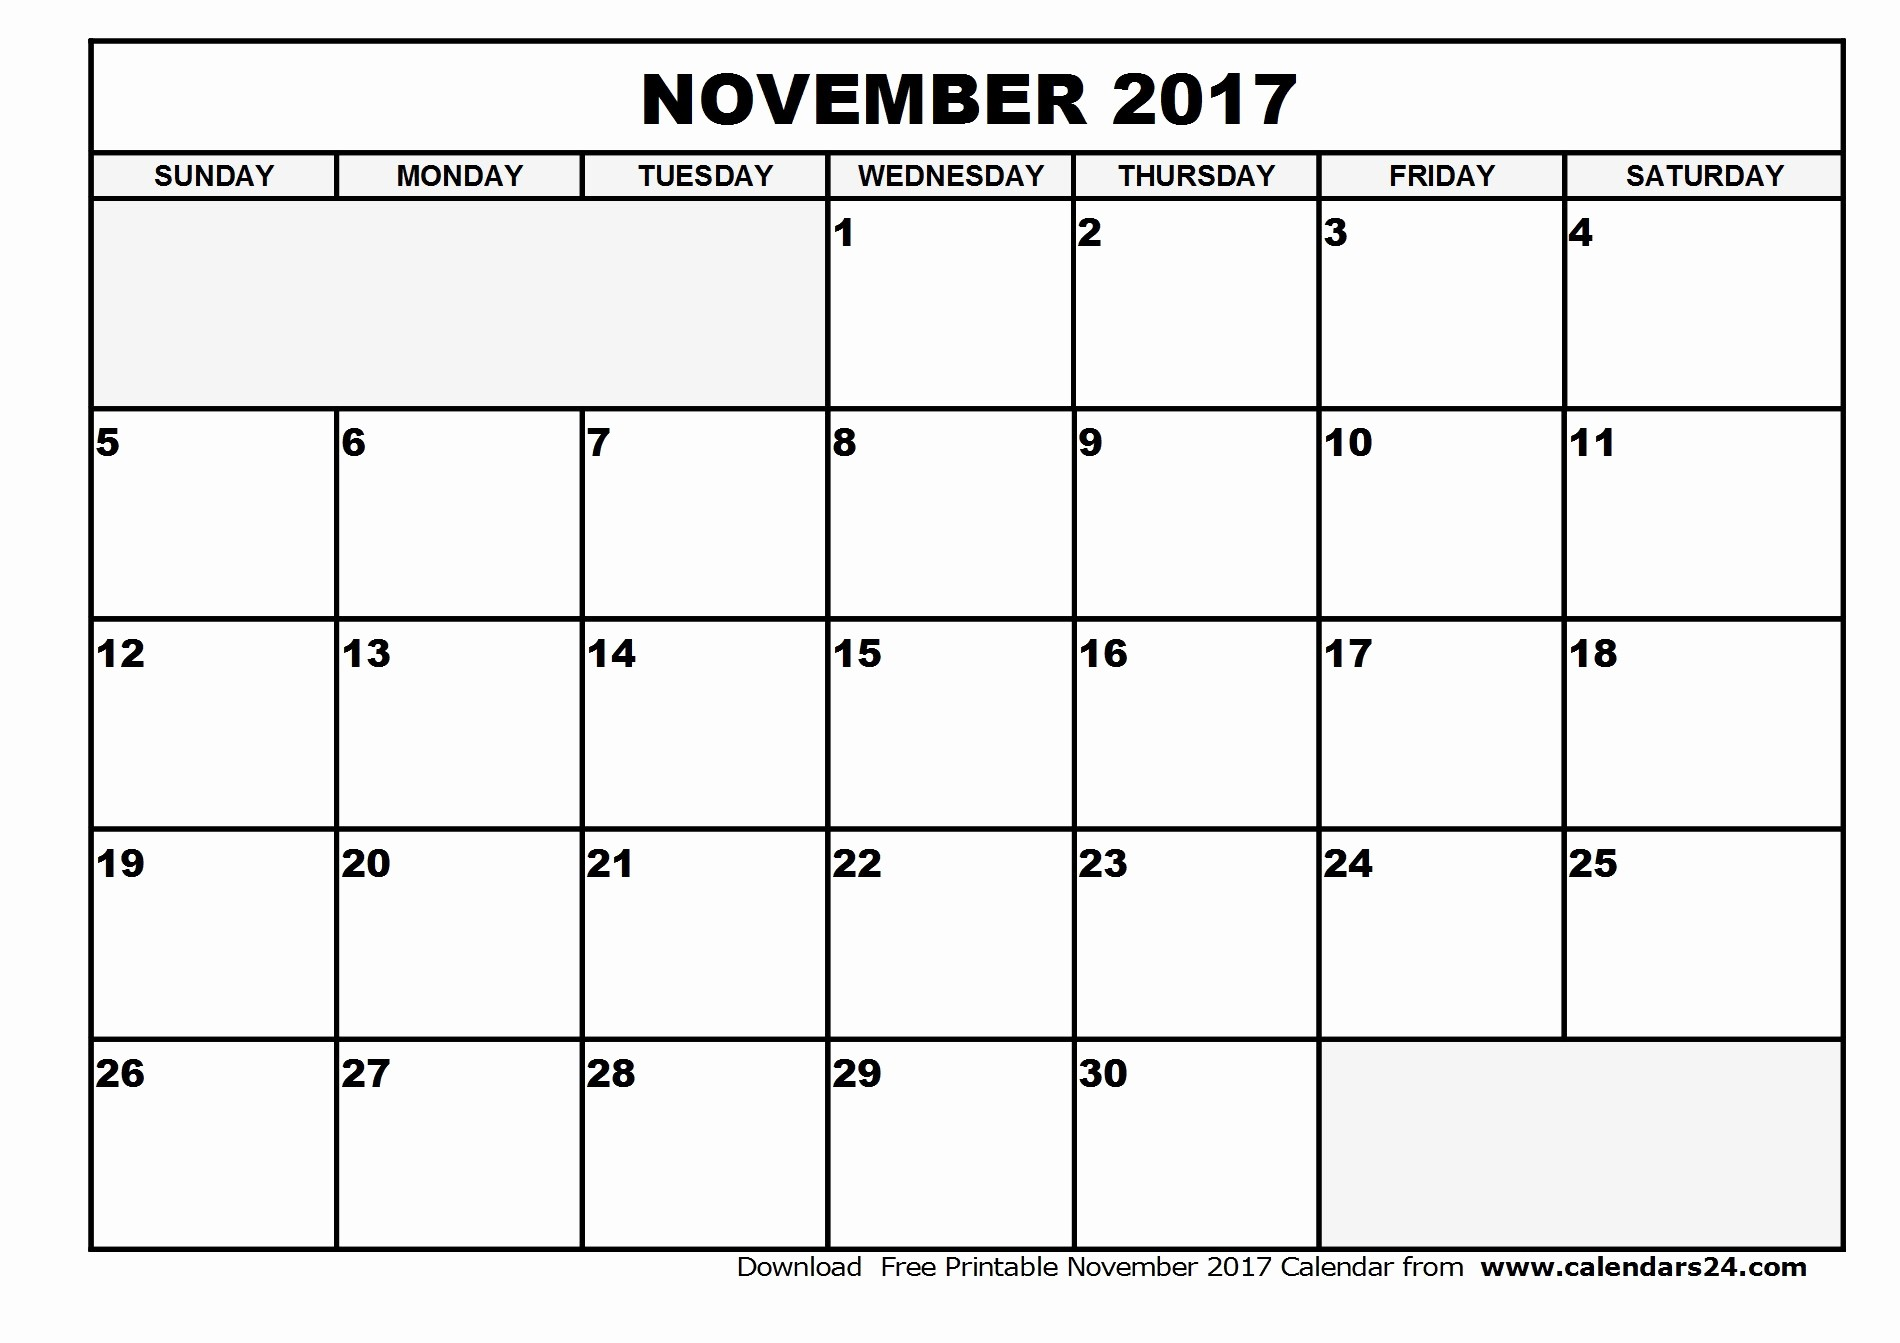 Blank November 2017 Calendar Template Best Of Blank Calendar November and December 2017 2018 Calendar